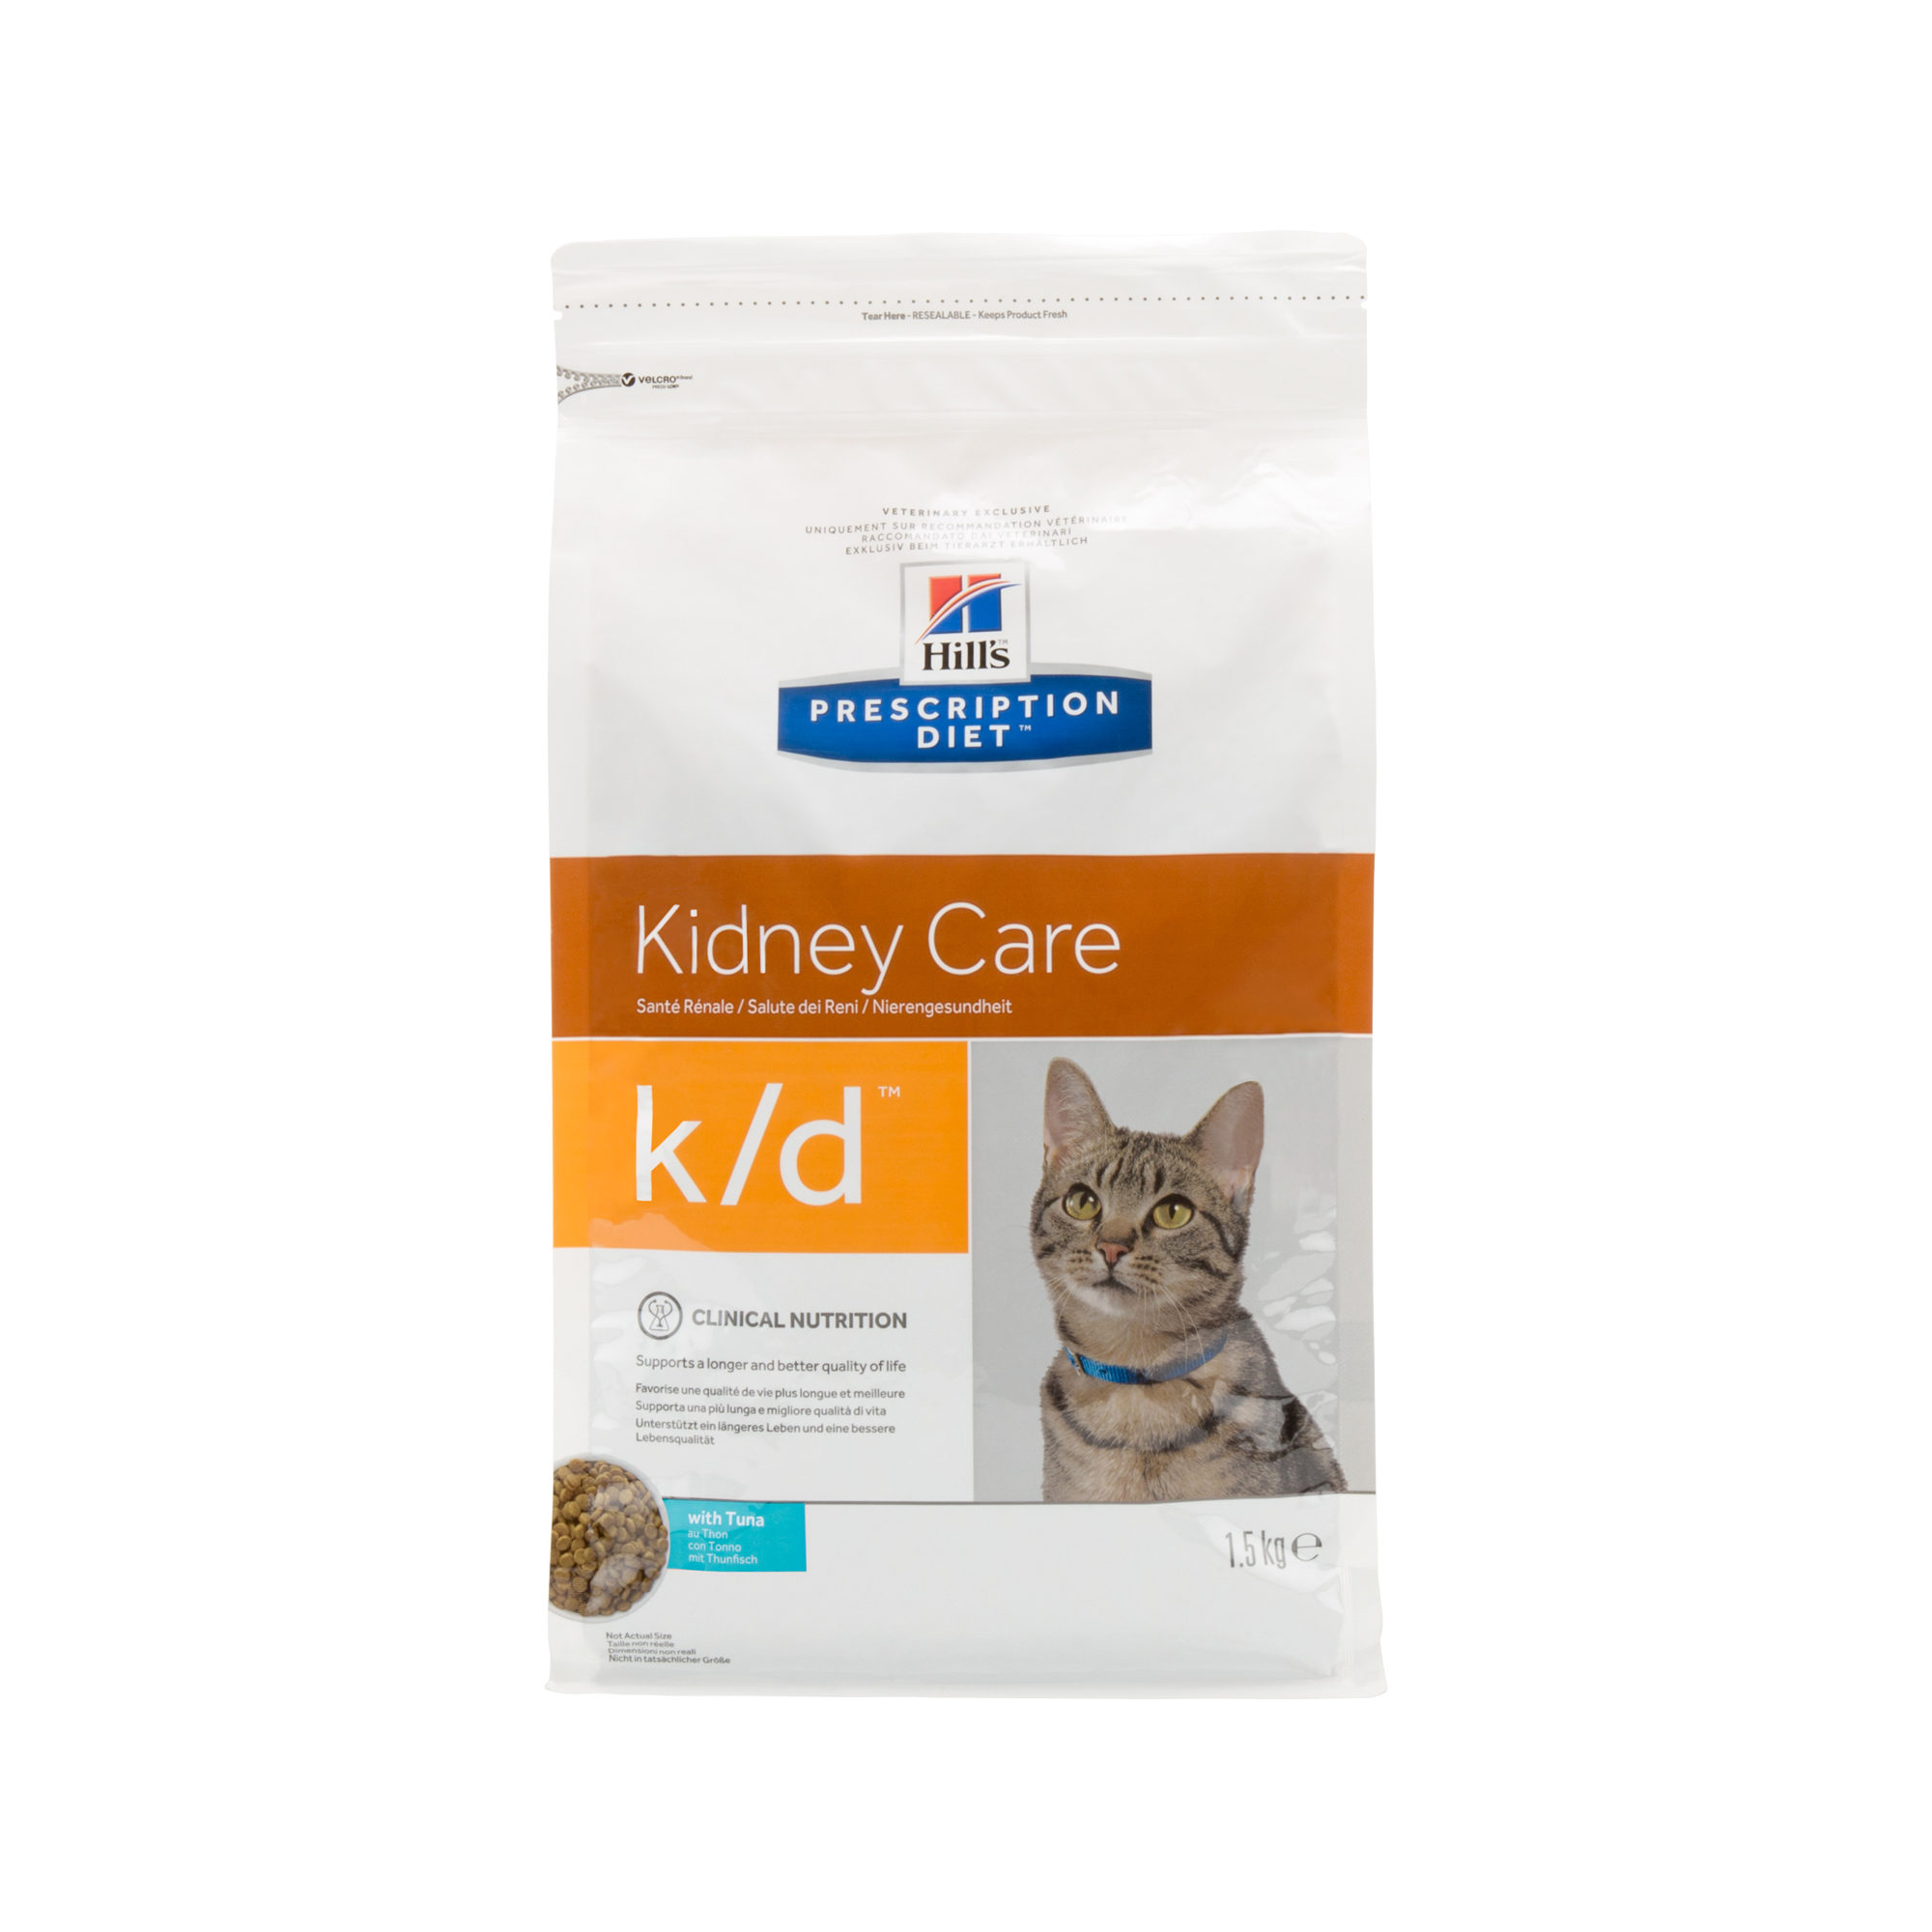 Hill's Prescription Diet k/d Kidney Care Katzenfutter - Tuna